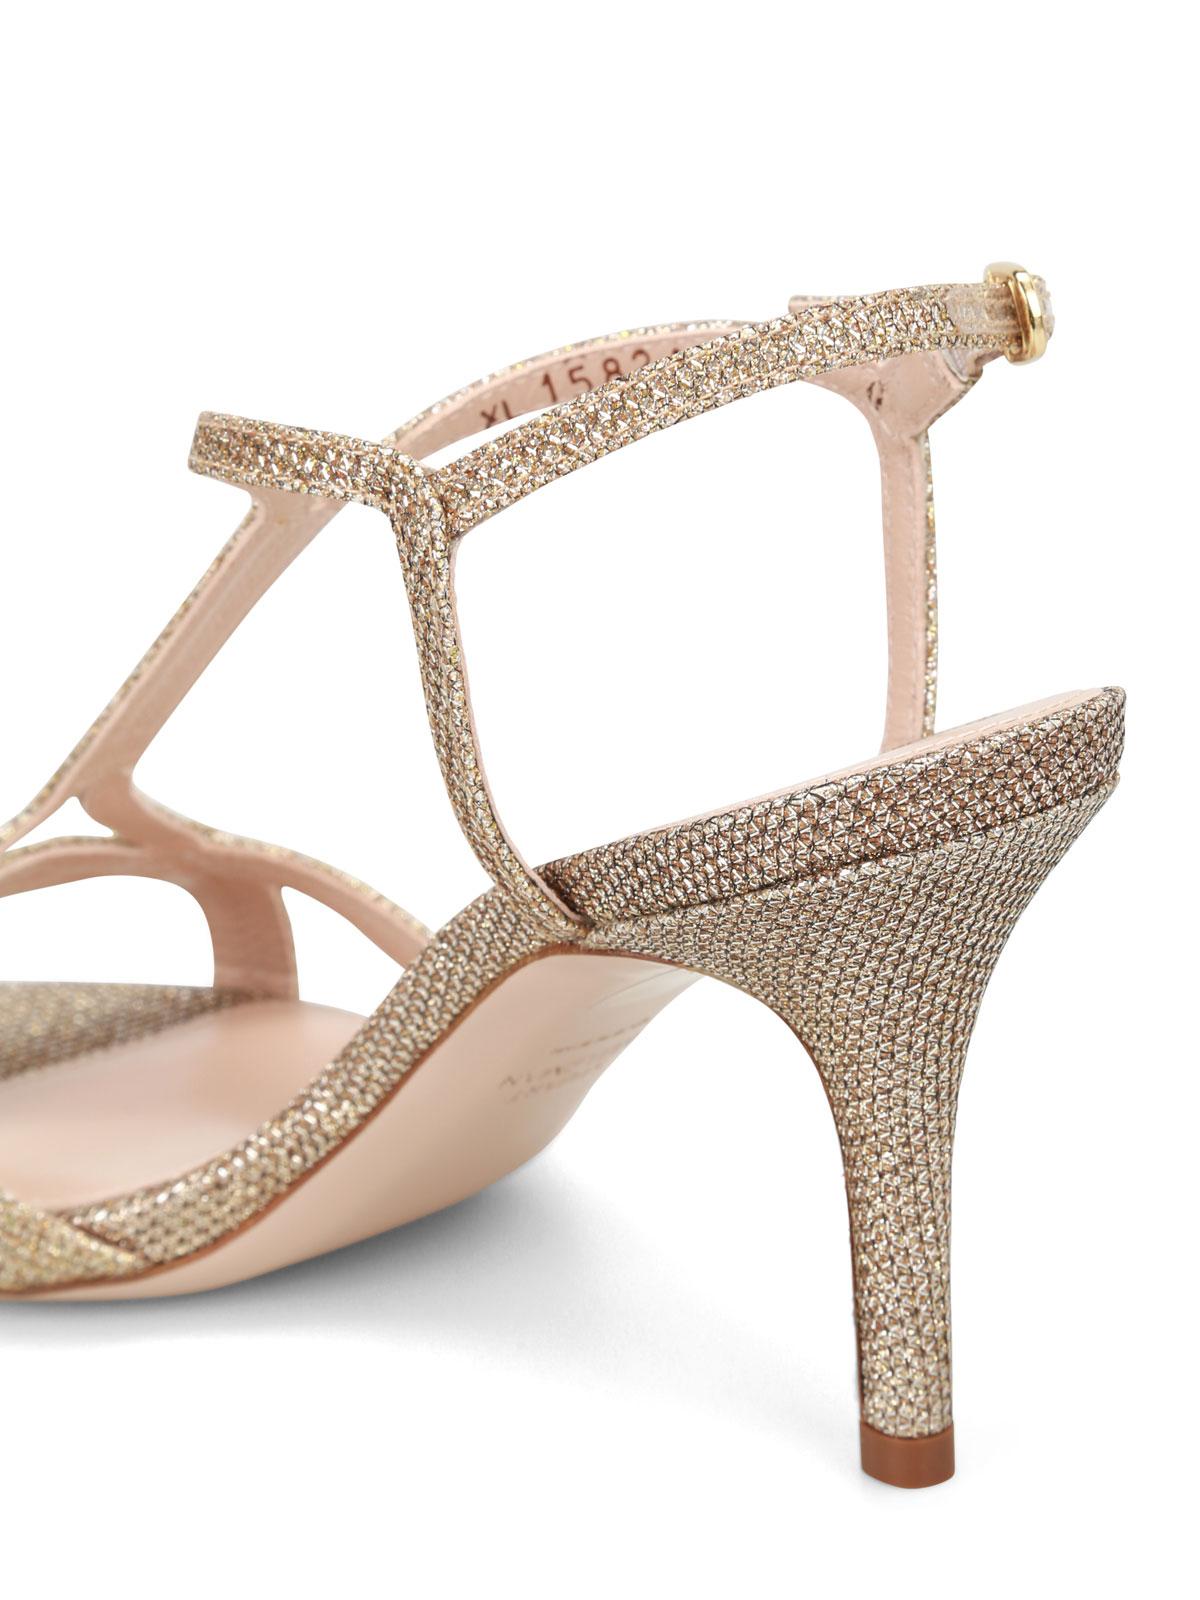 20a9a64aeb6f4 Stuart Weitzman - Sunny sandals - sandals - XL15821